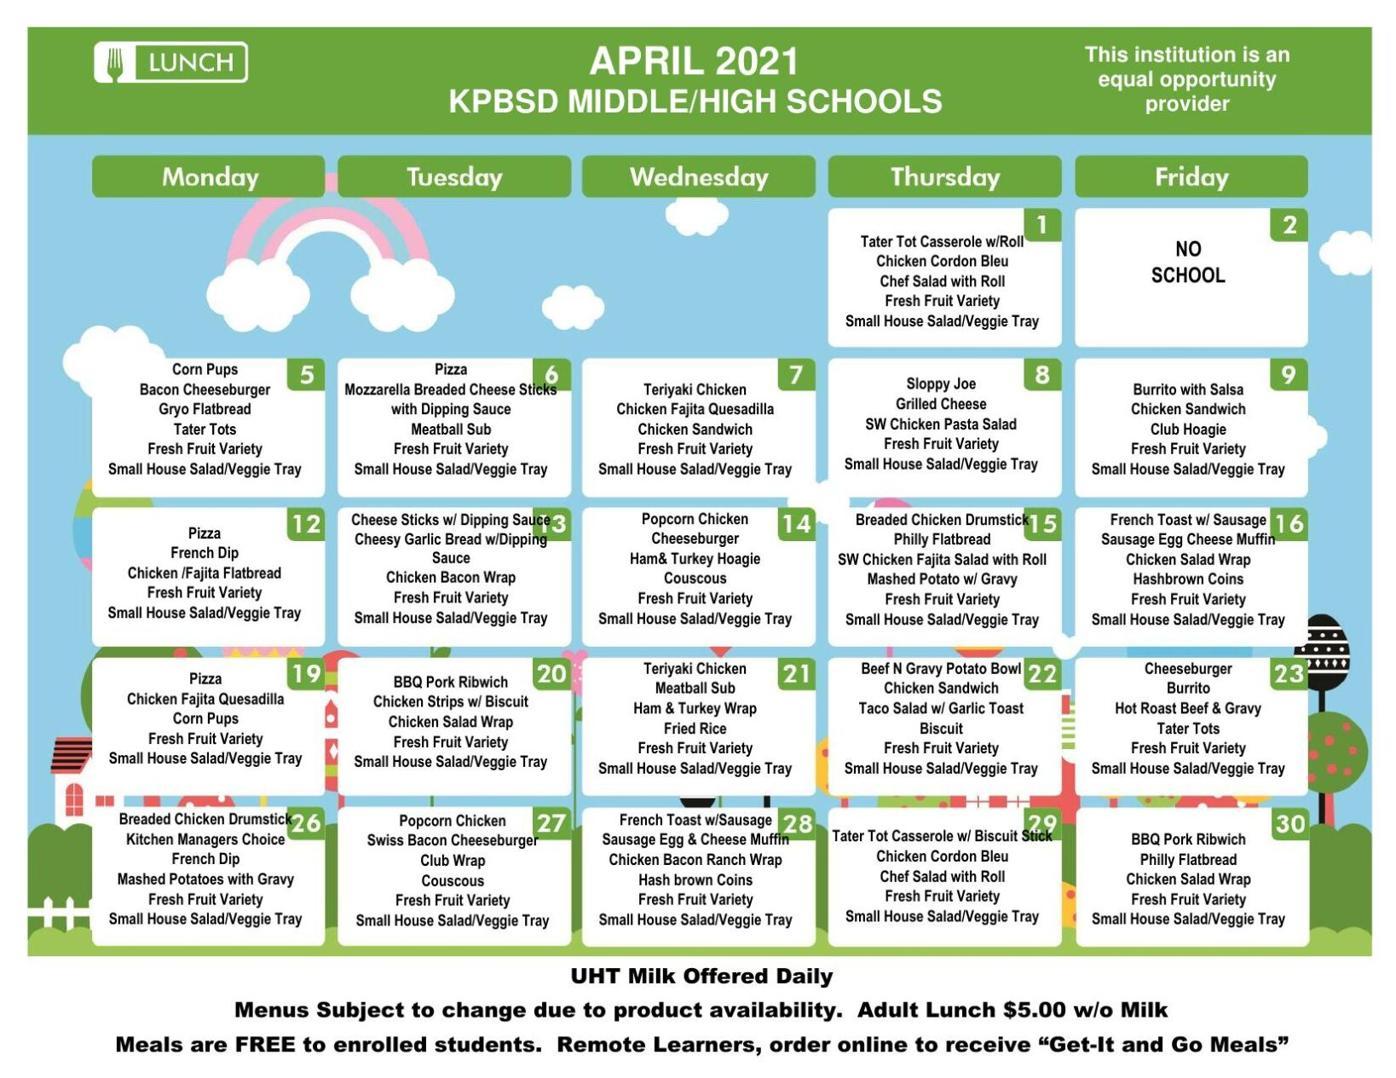 Seward Middle School Lunch Menu April 2021